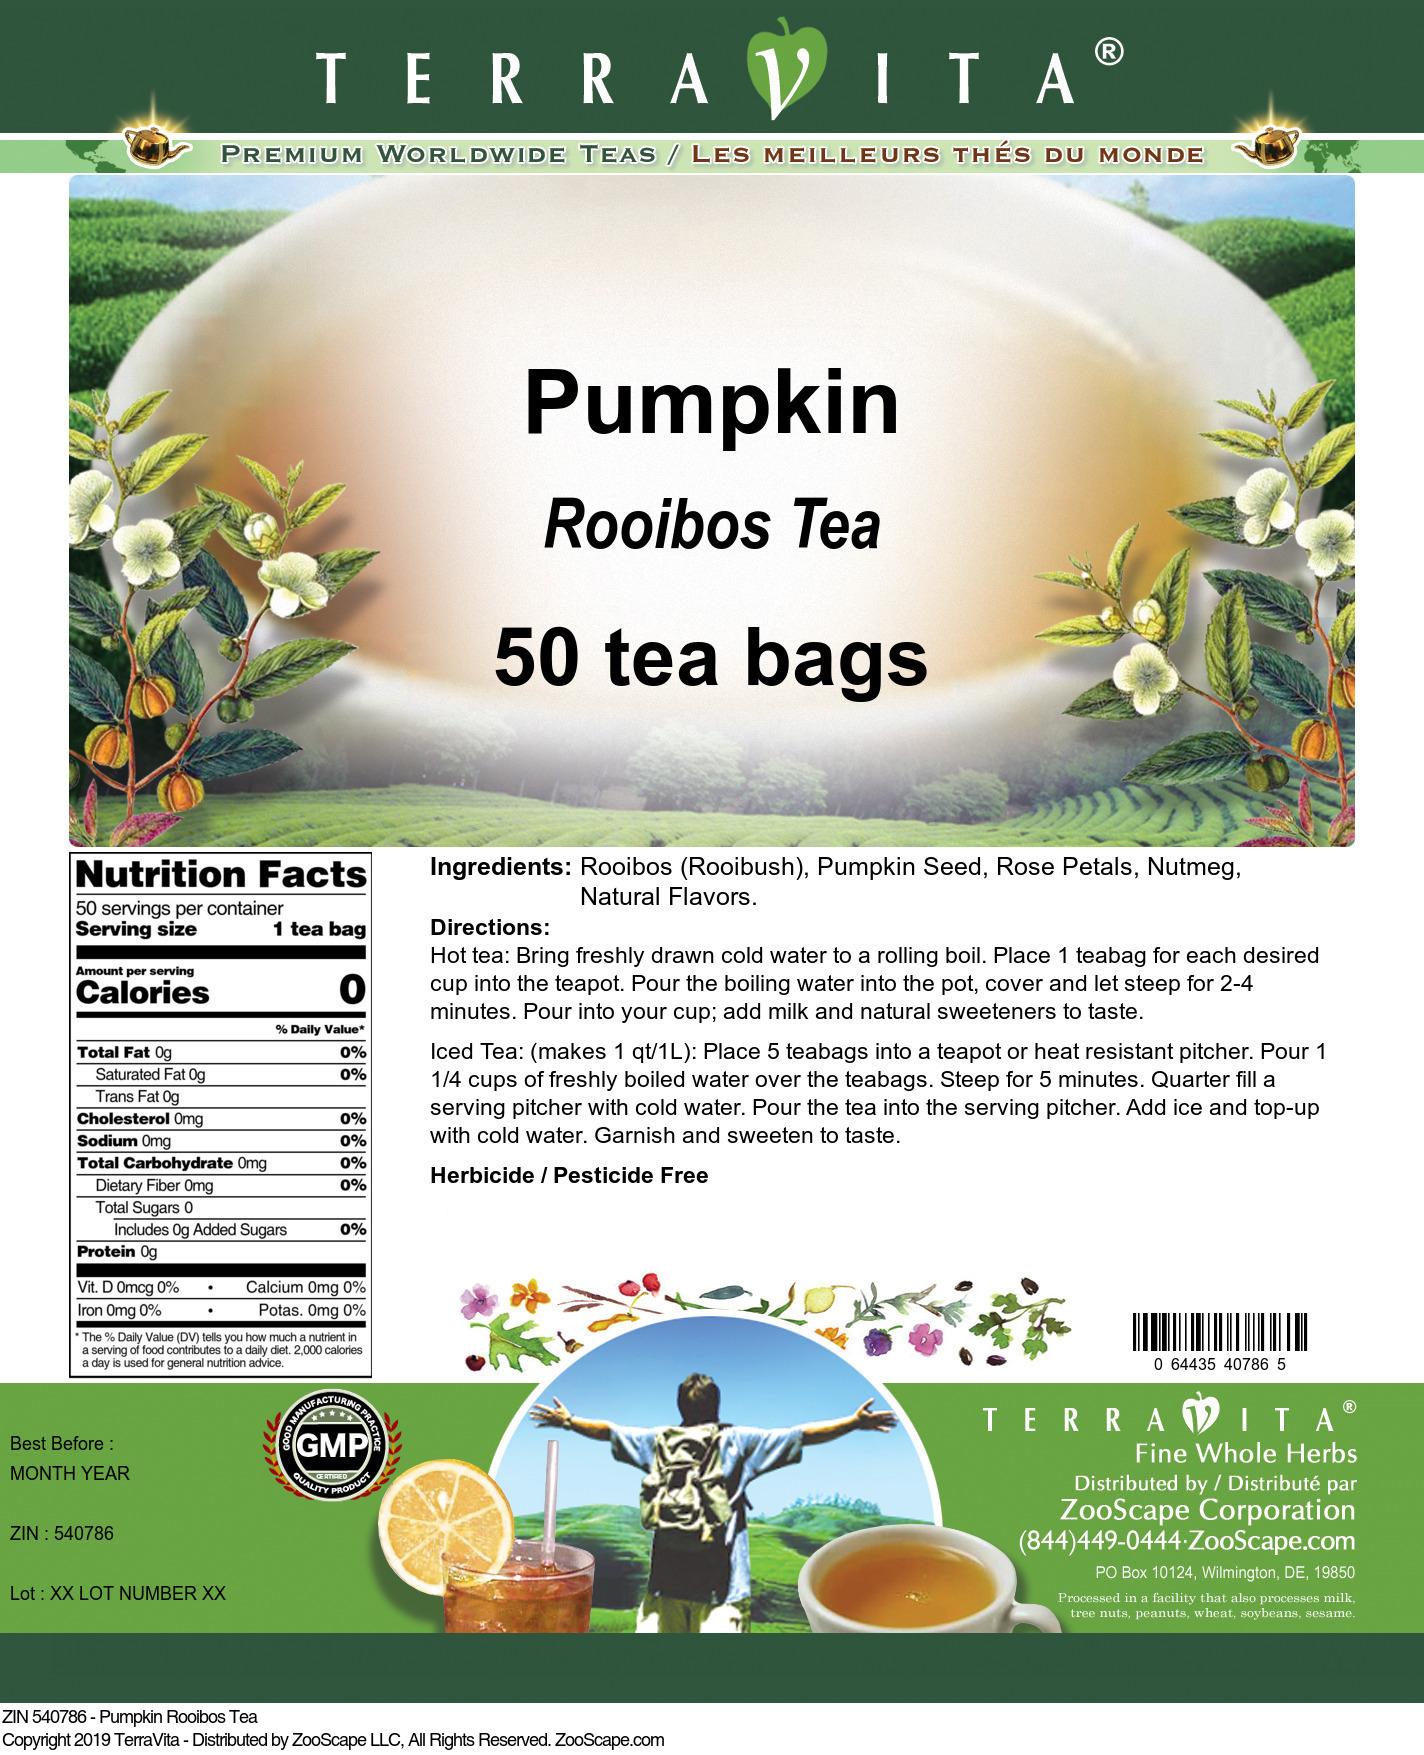 Pumpkin Rooibos Tea